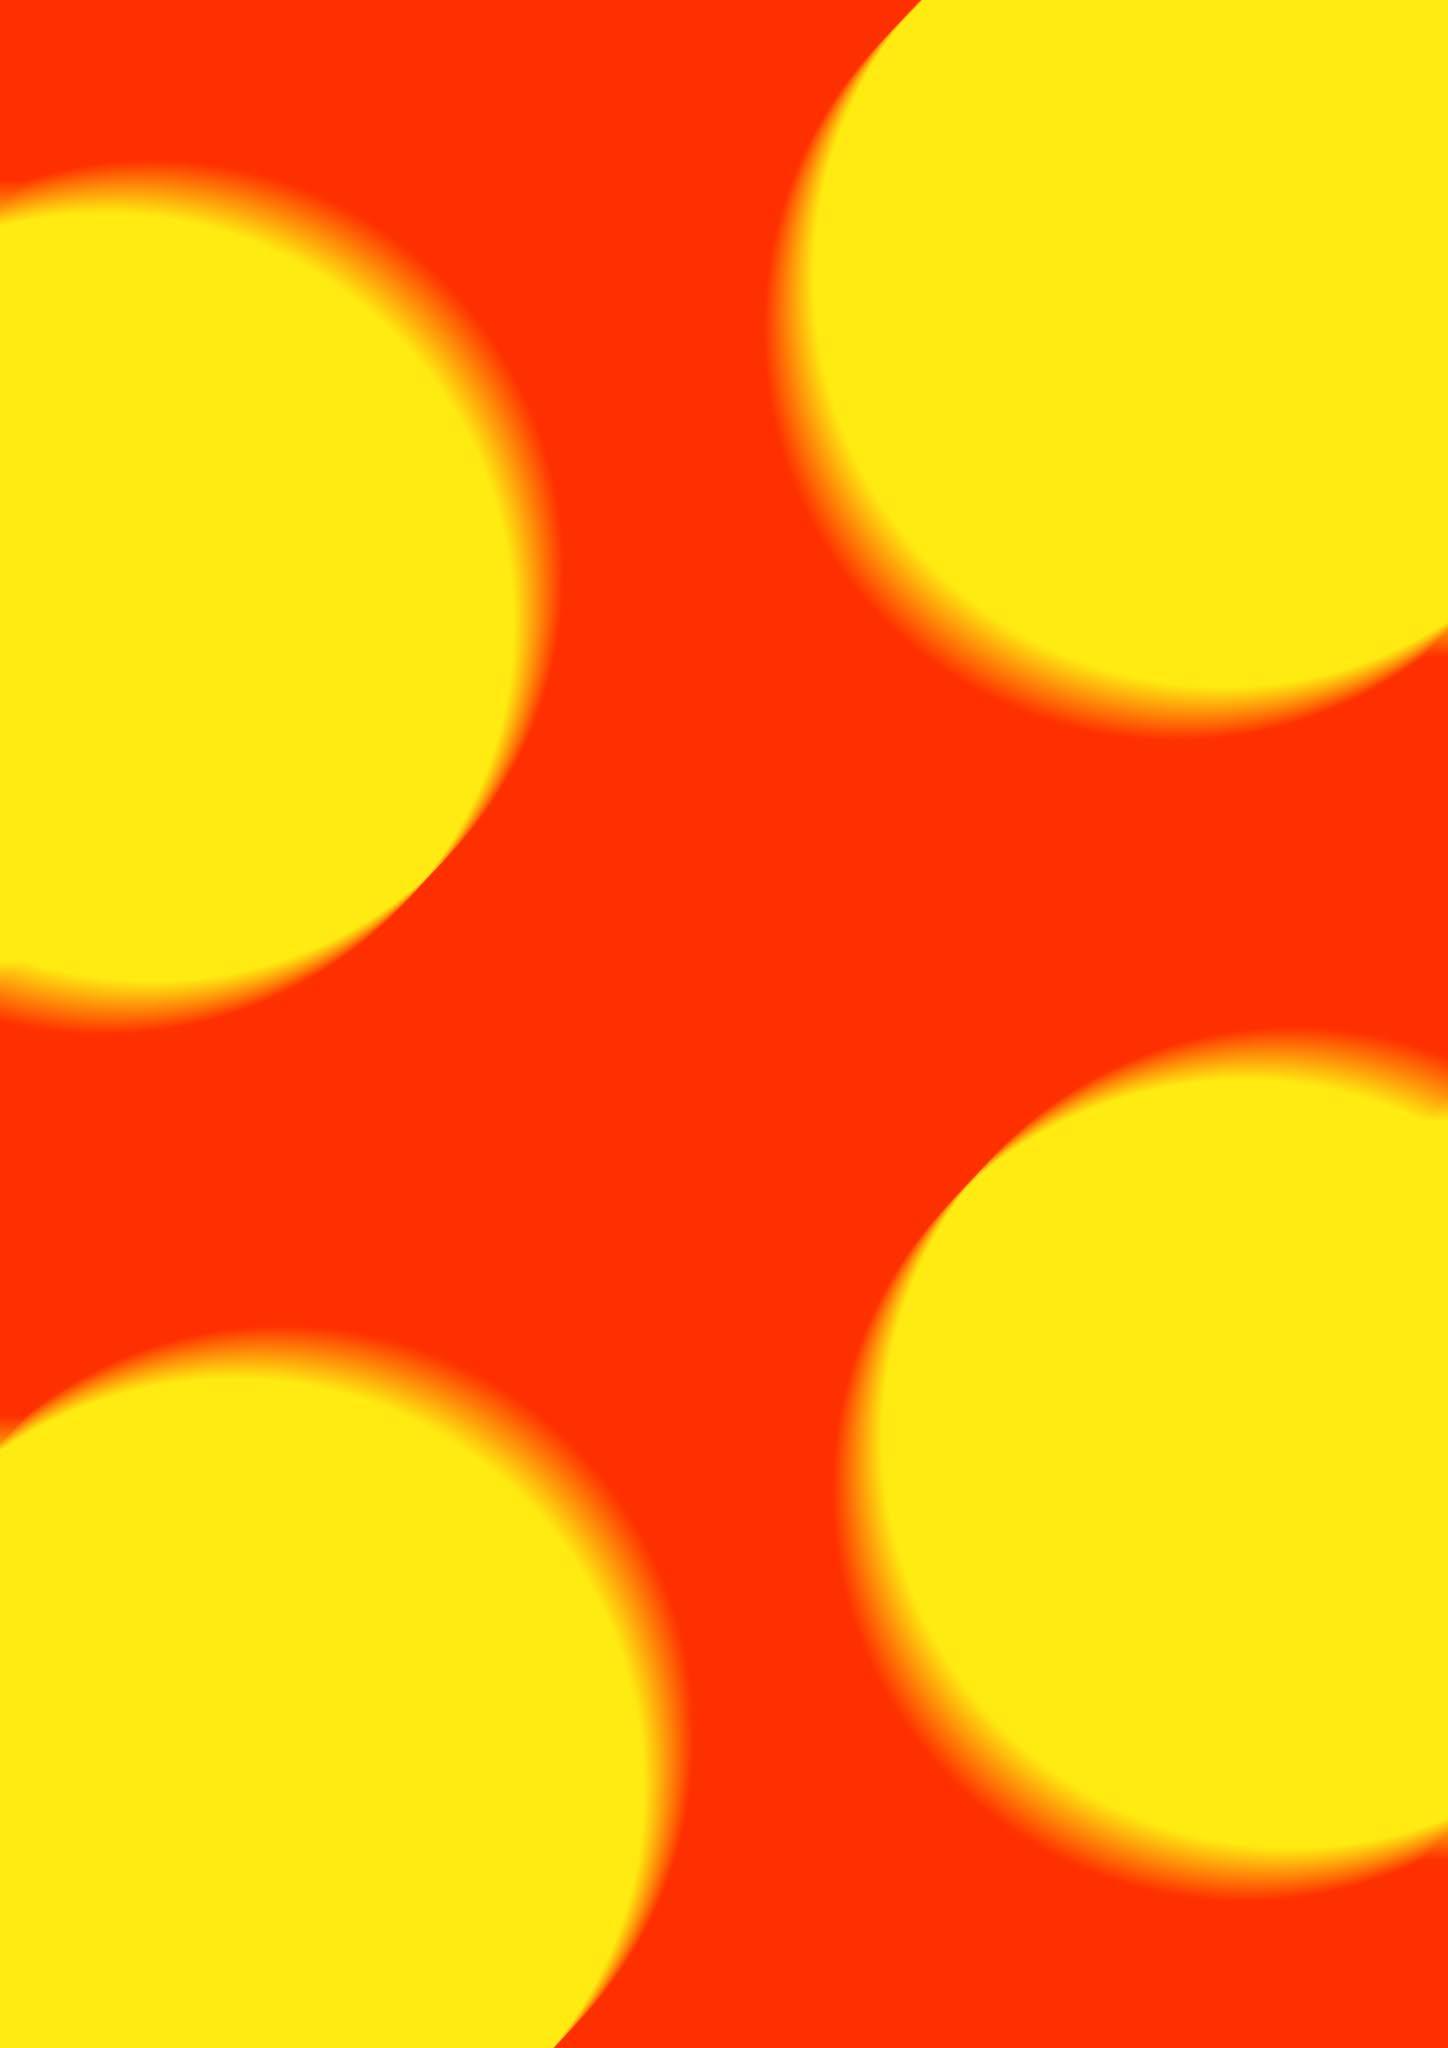 yellow ball blur